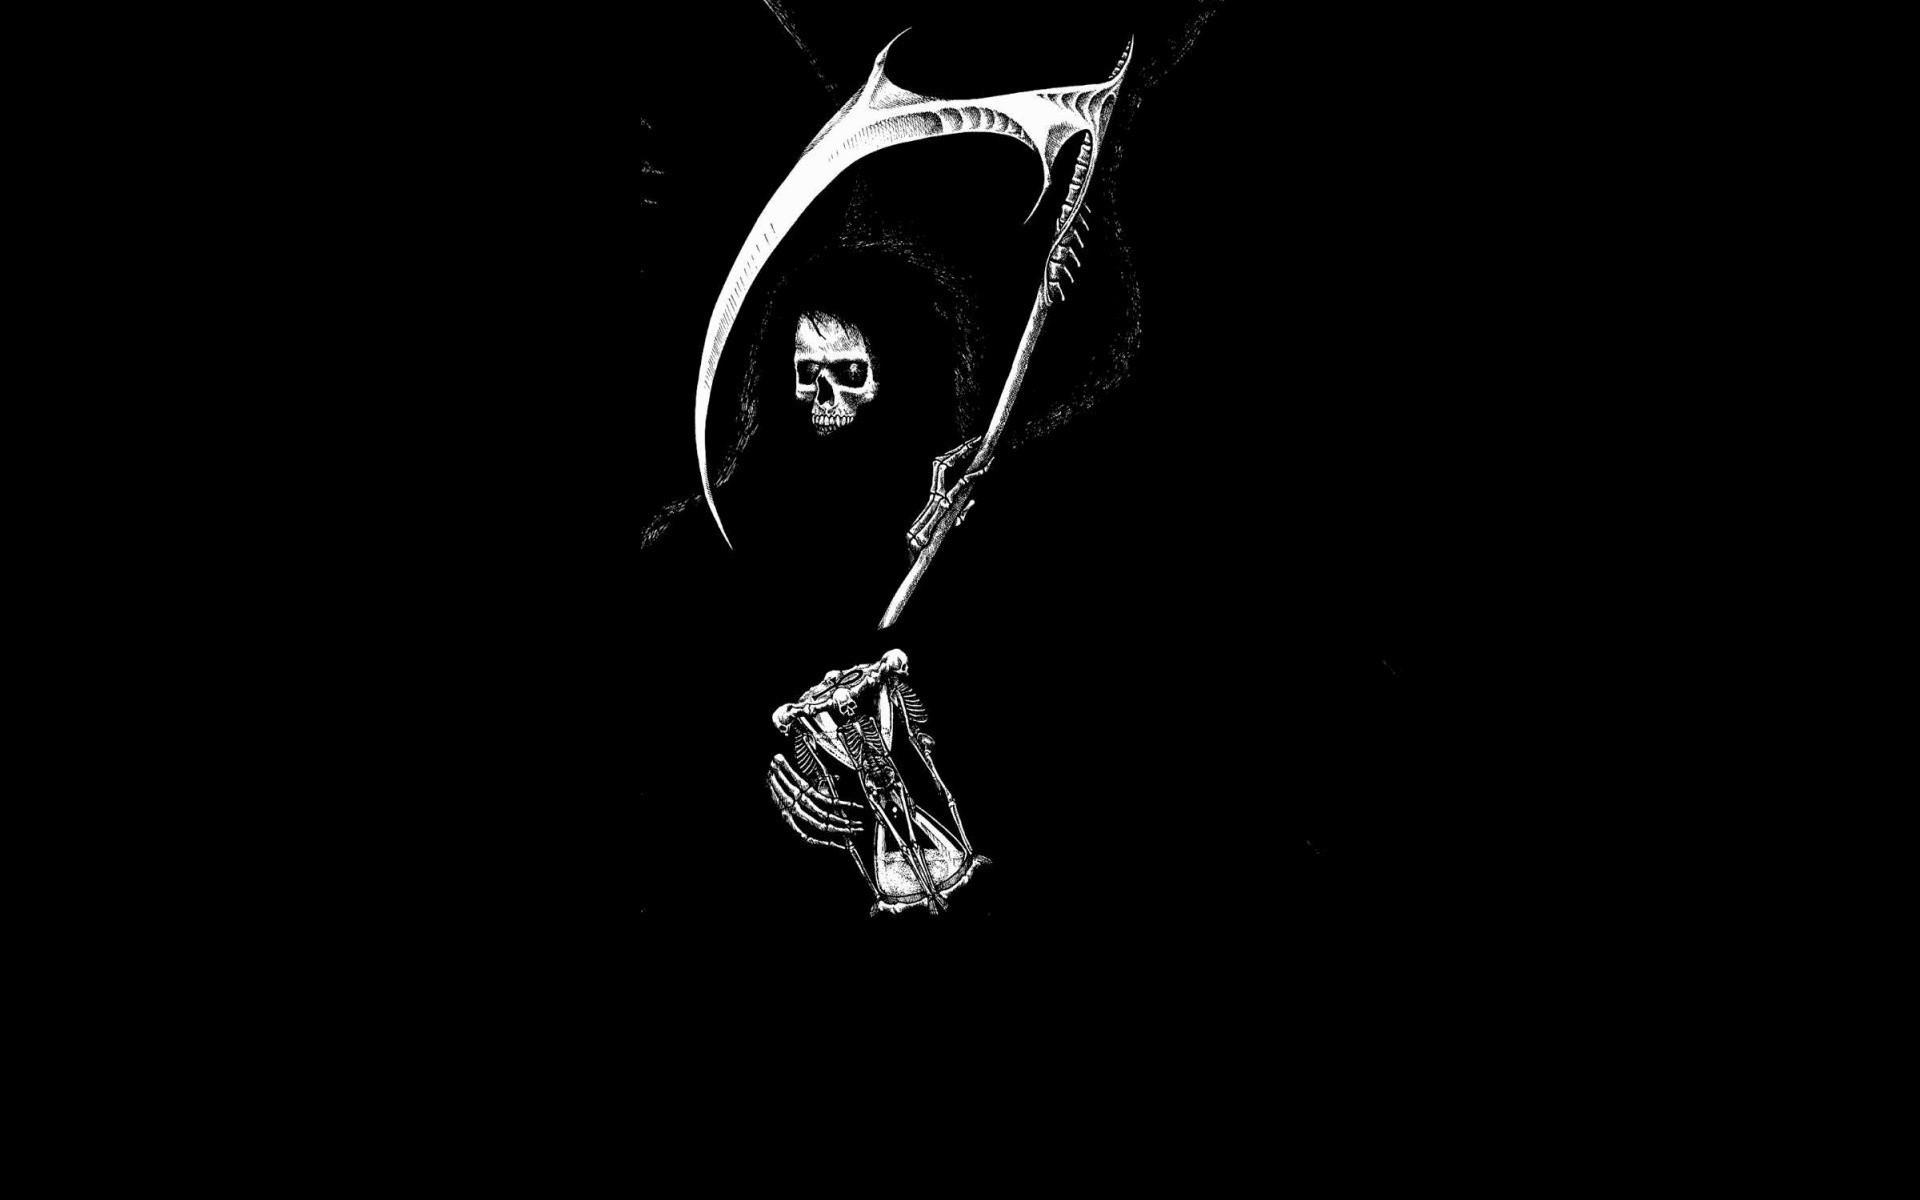 Wallpaper Fantasy Art Spooky Artwork Death Gothic